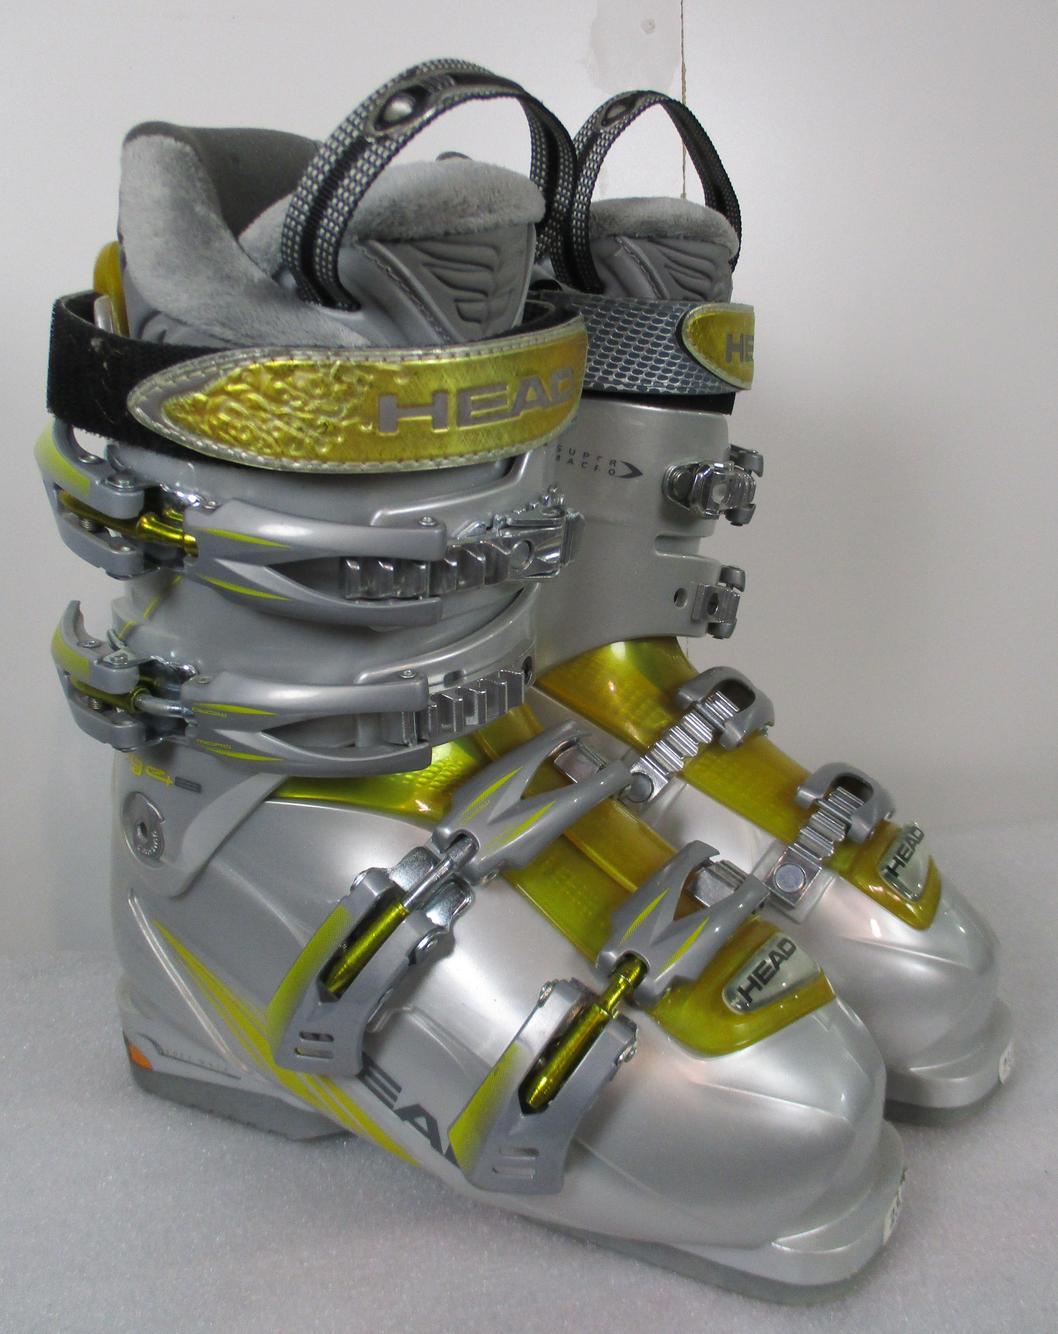 Head BYS Adult Ski Boots Size 8.5 Mondo 26.5 Used